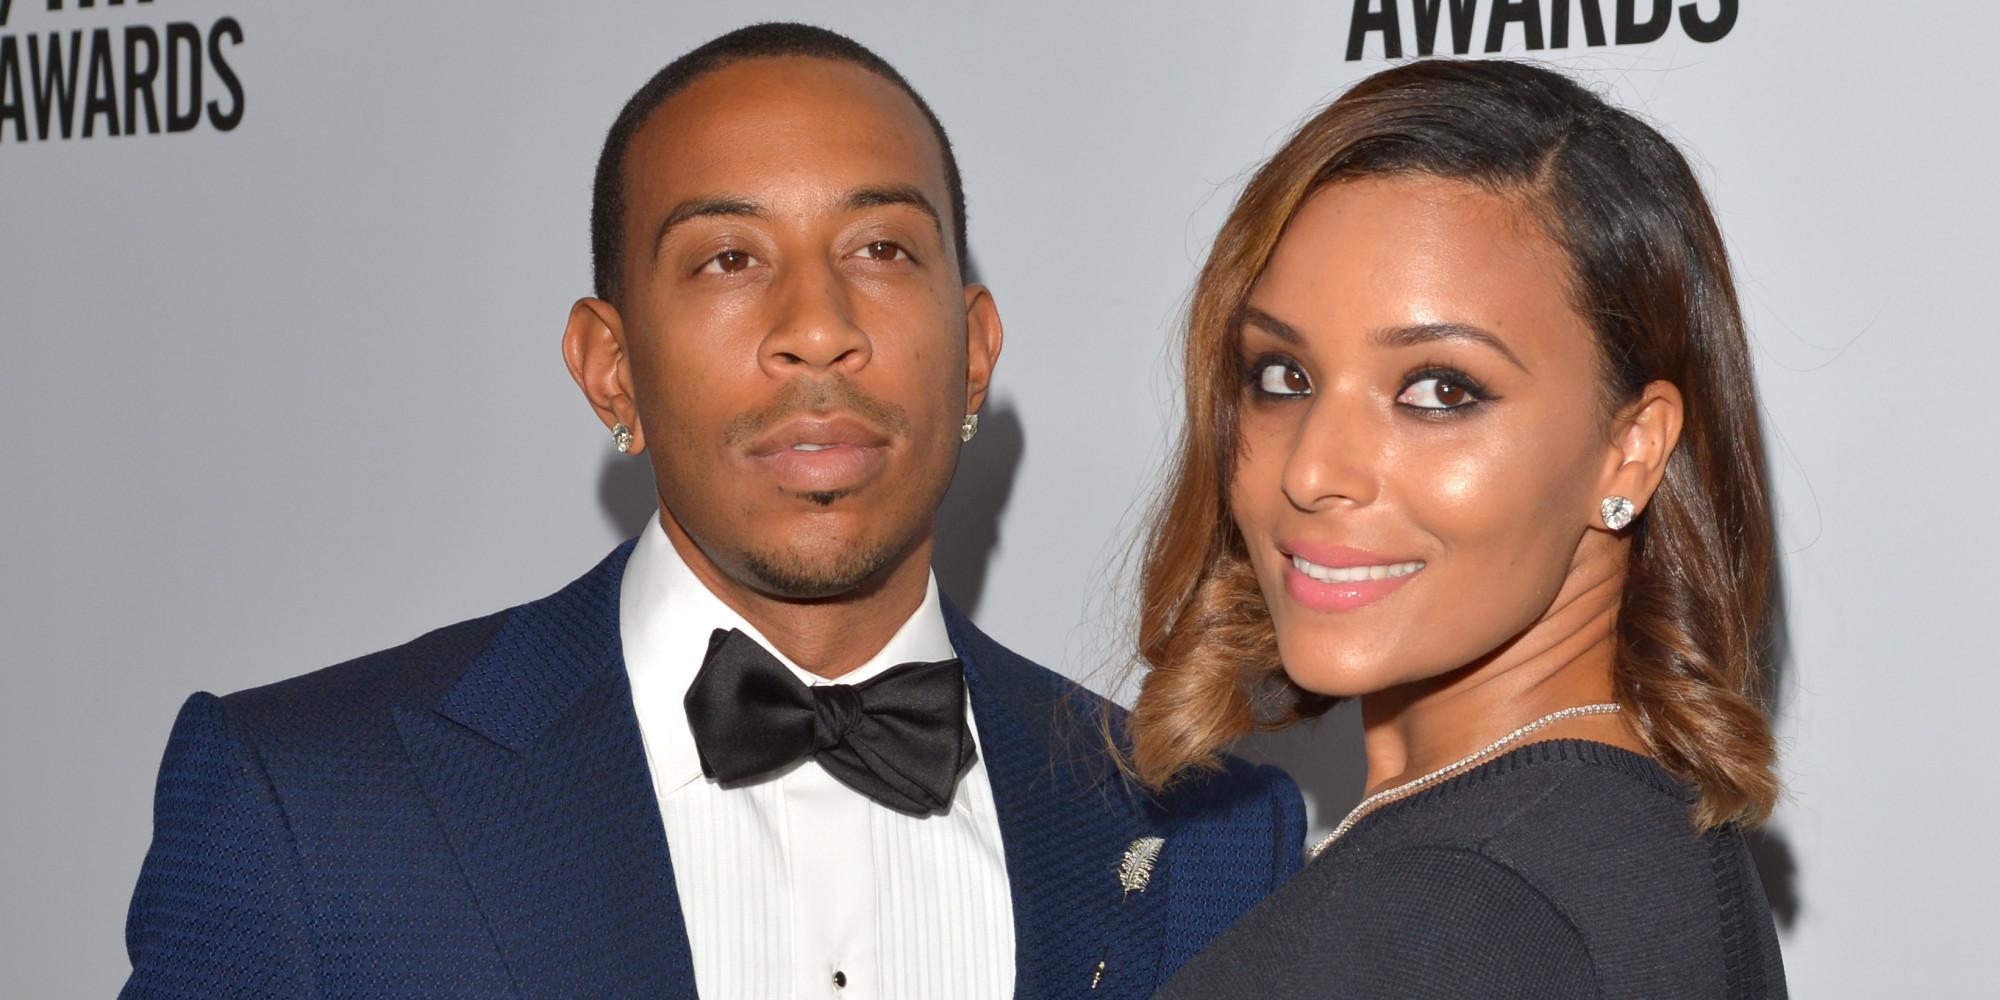 Ludacris Marries Eudoxie Mbouguiengue